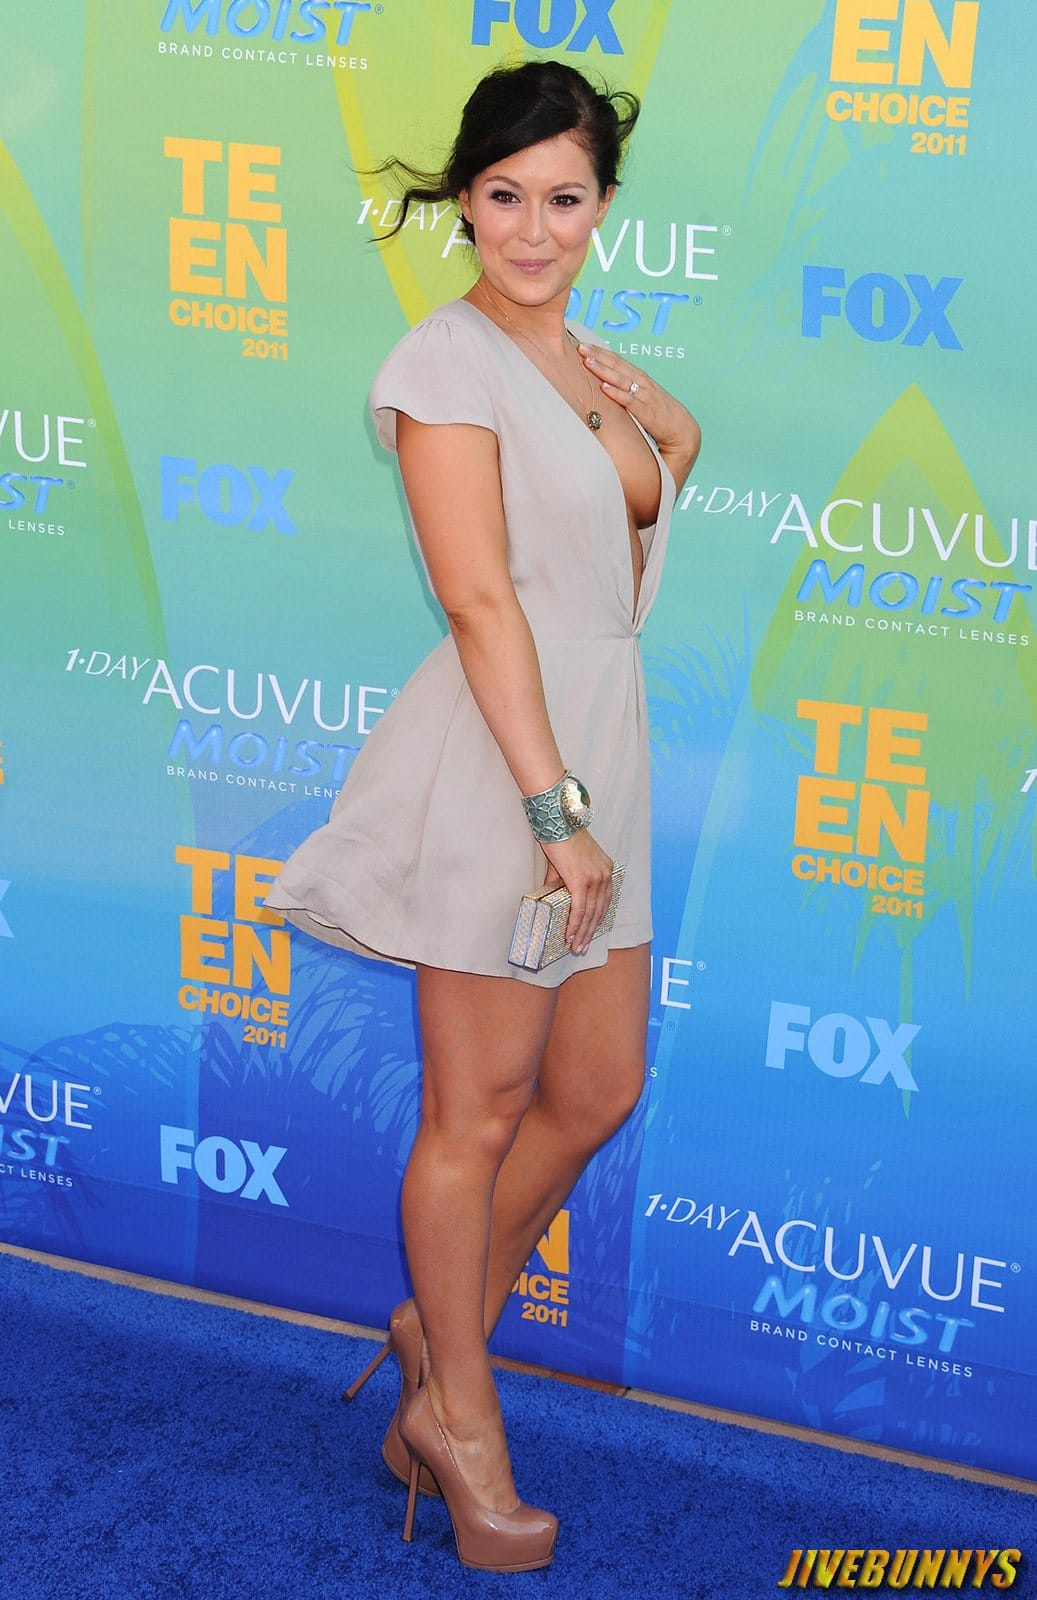 Alexa vega cleavage will